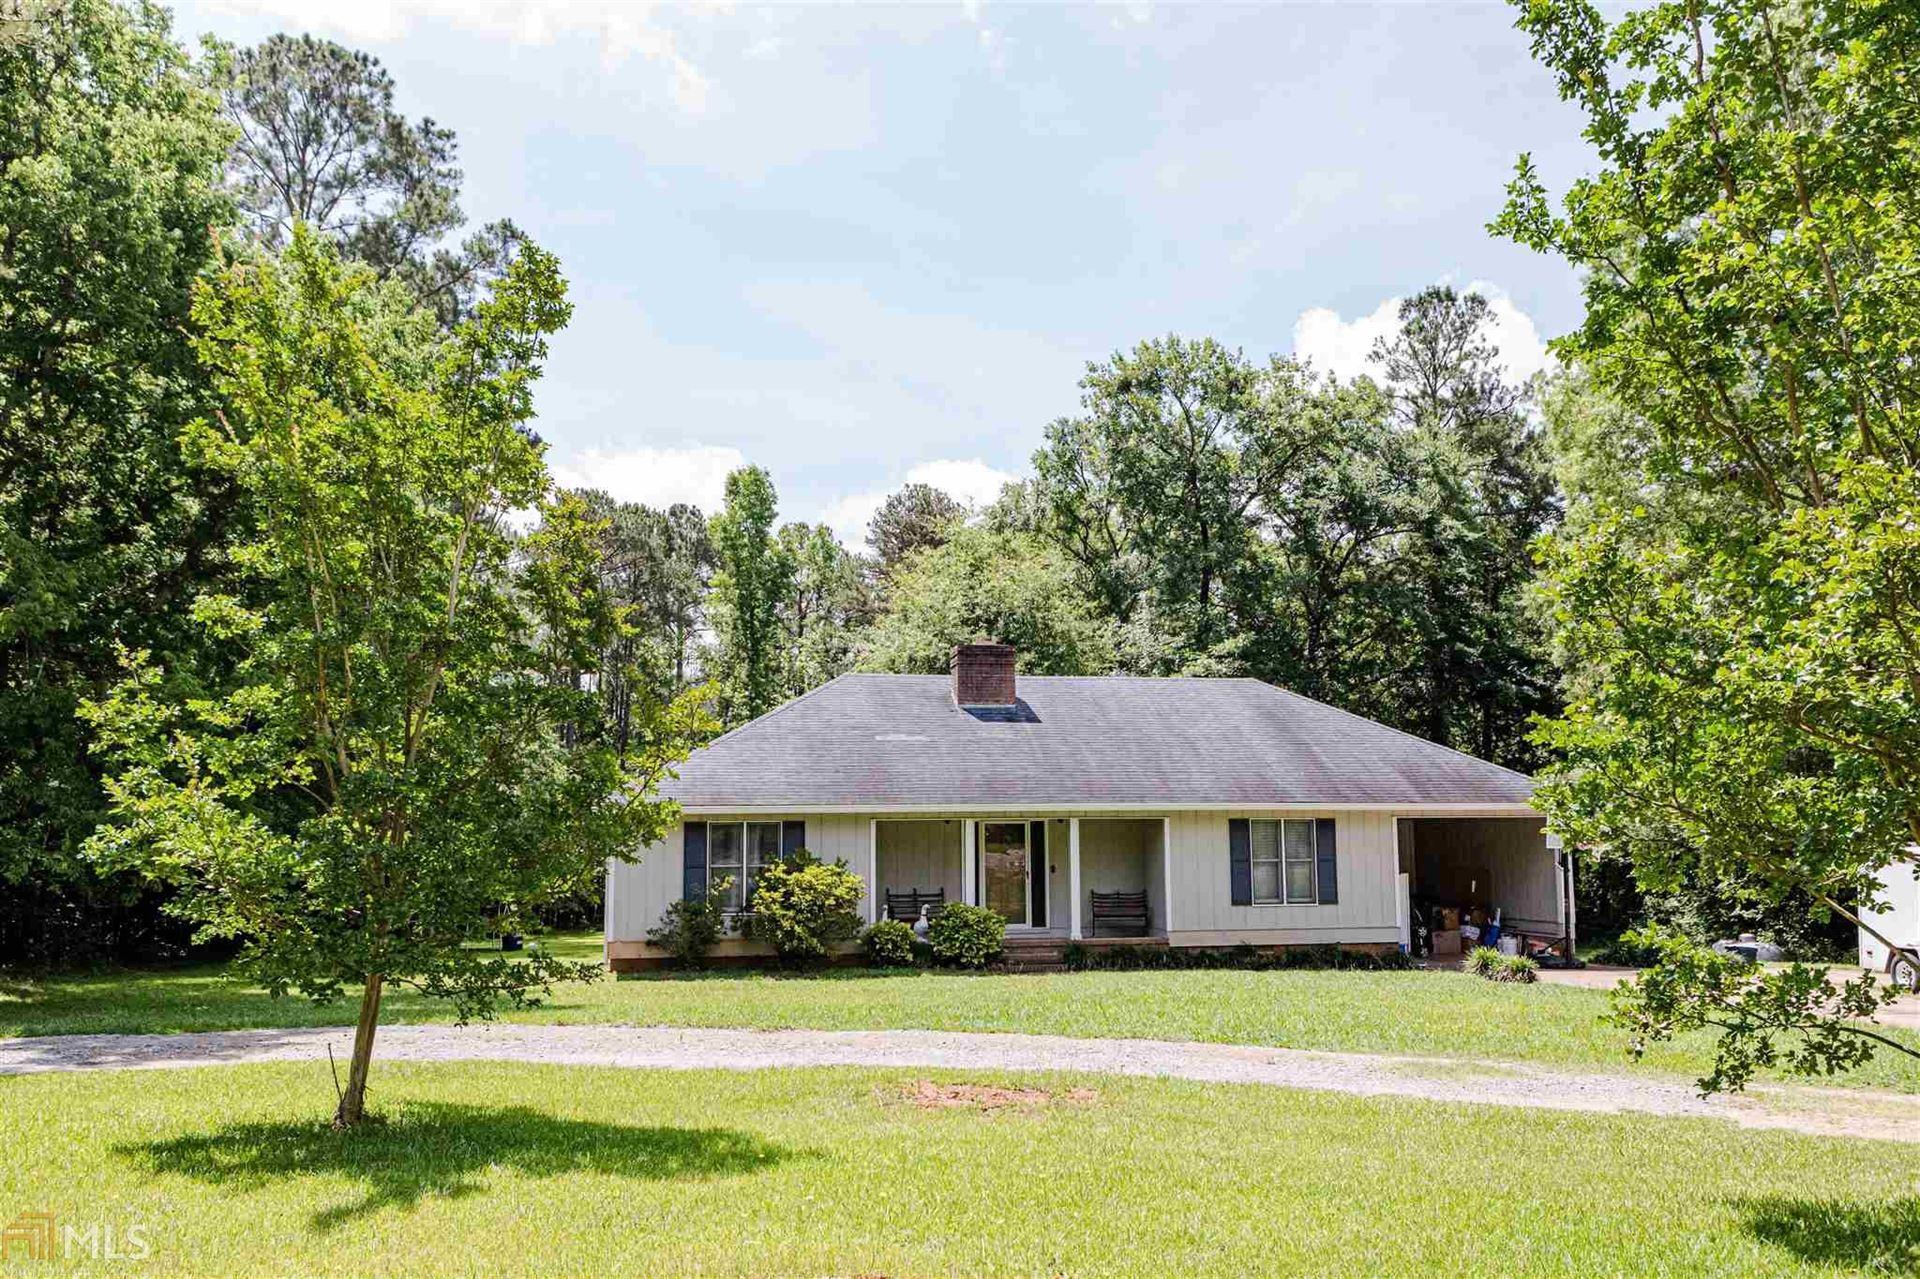 1123 Crooked Creek Rd, Eatonton, GA 31024 - MLS#: 8994959